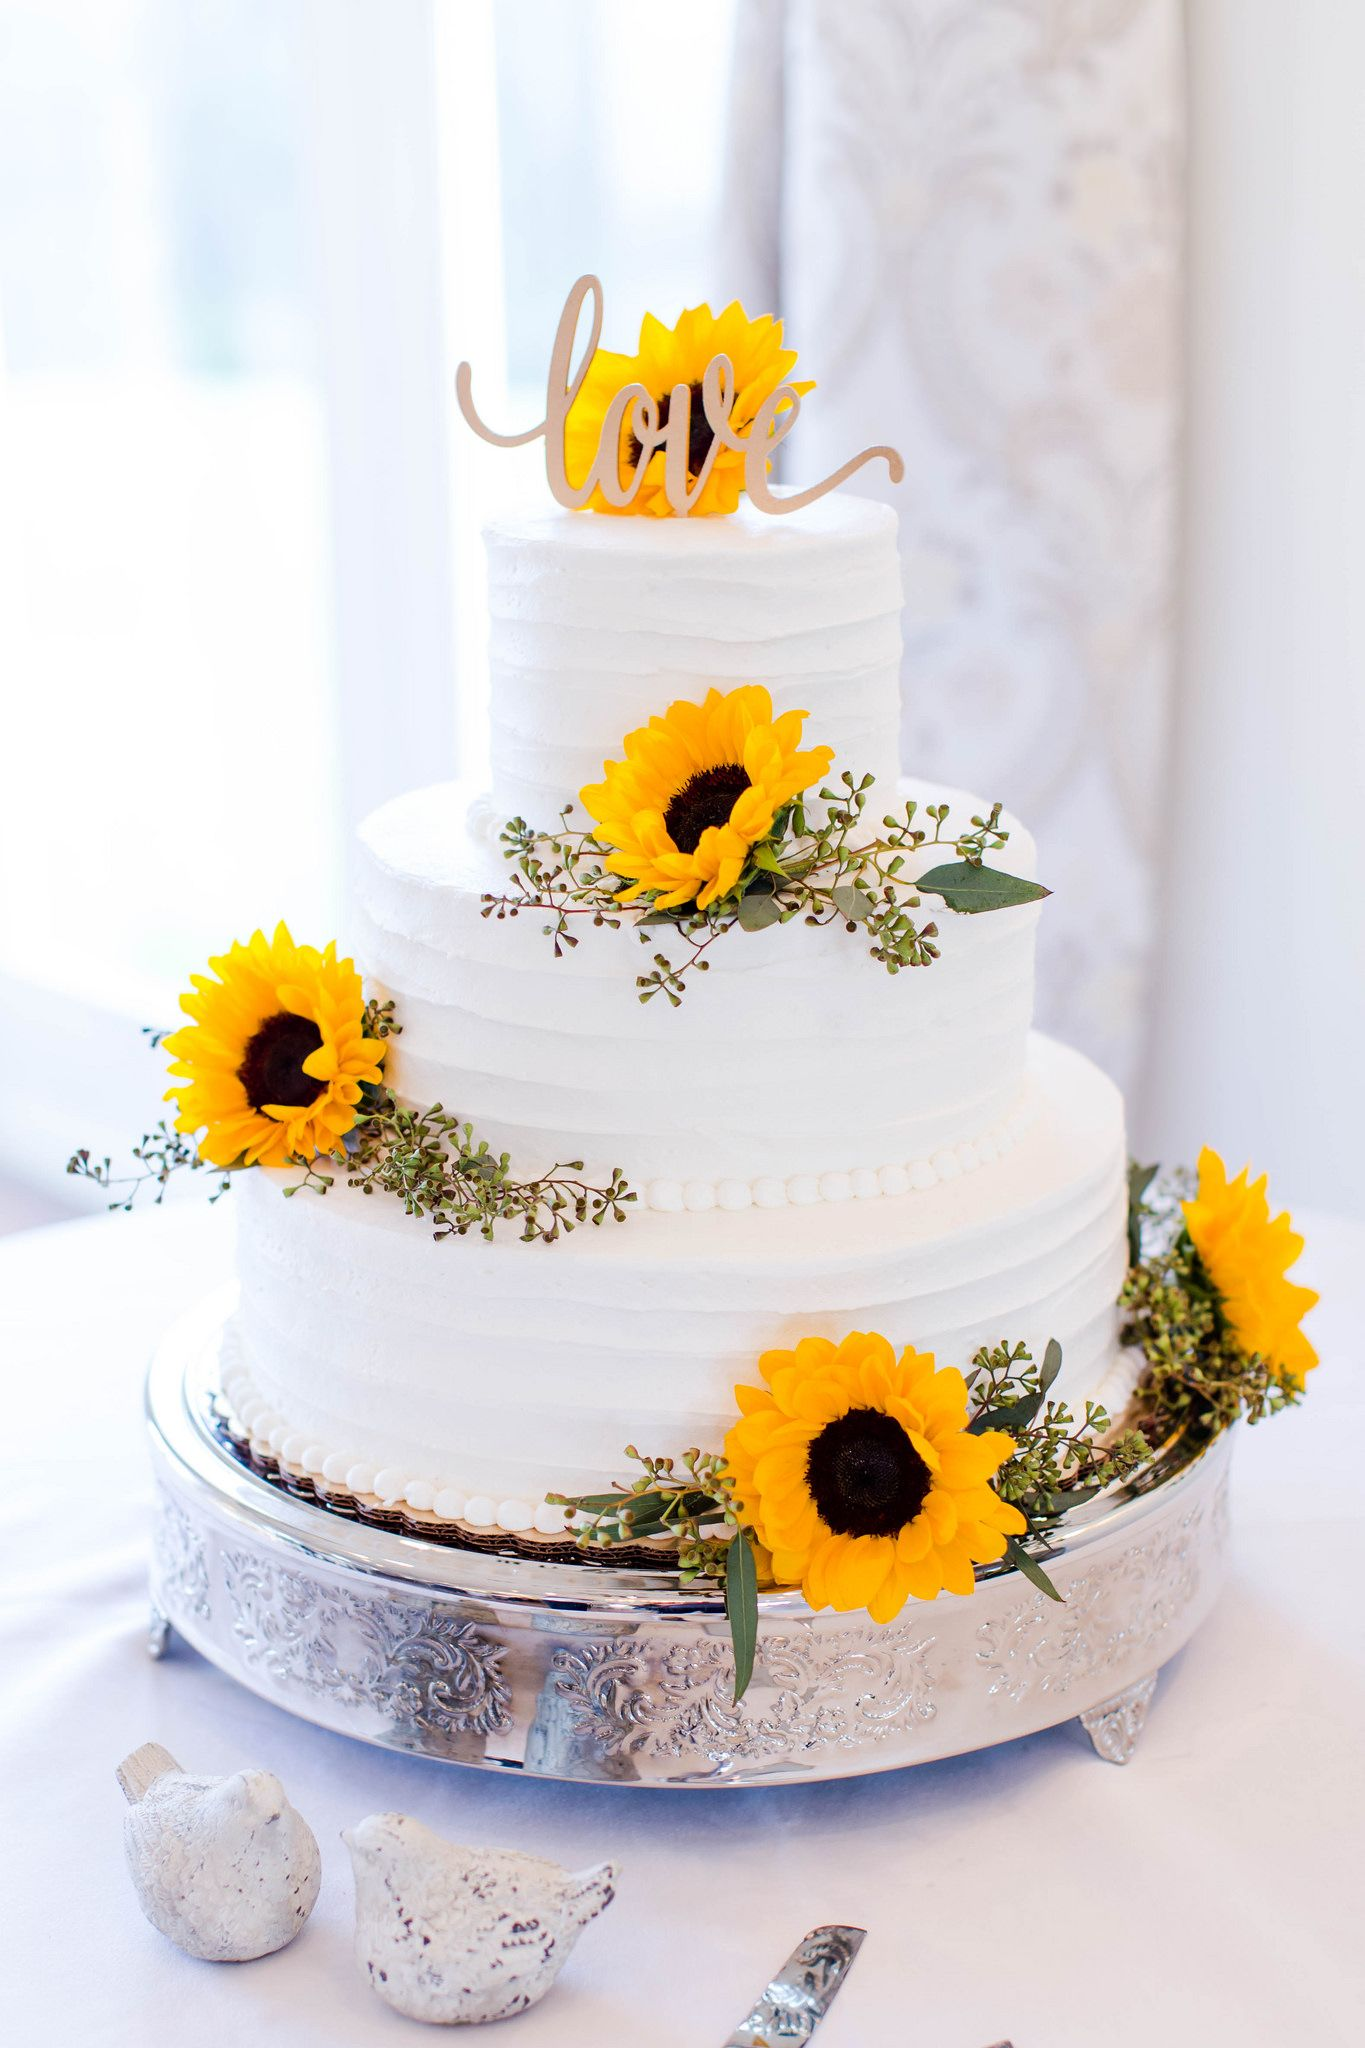 Ermin & Laura Wedding cake centerpieces, Themed wedding